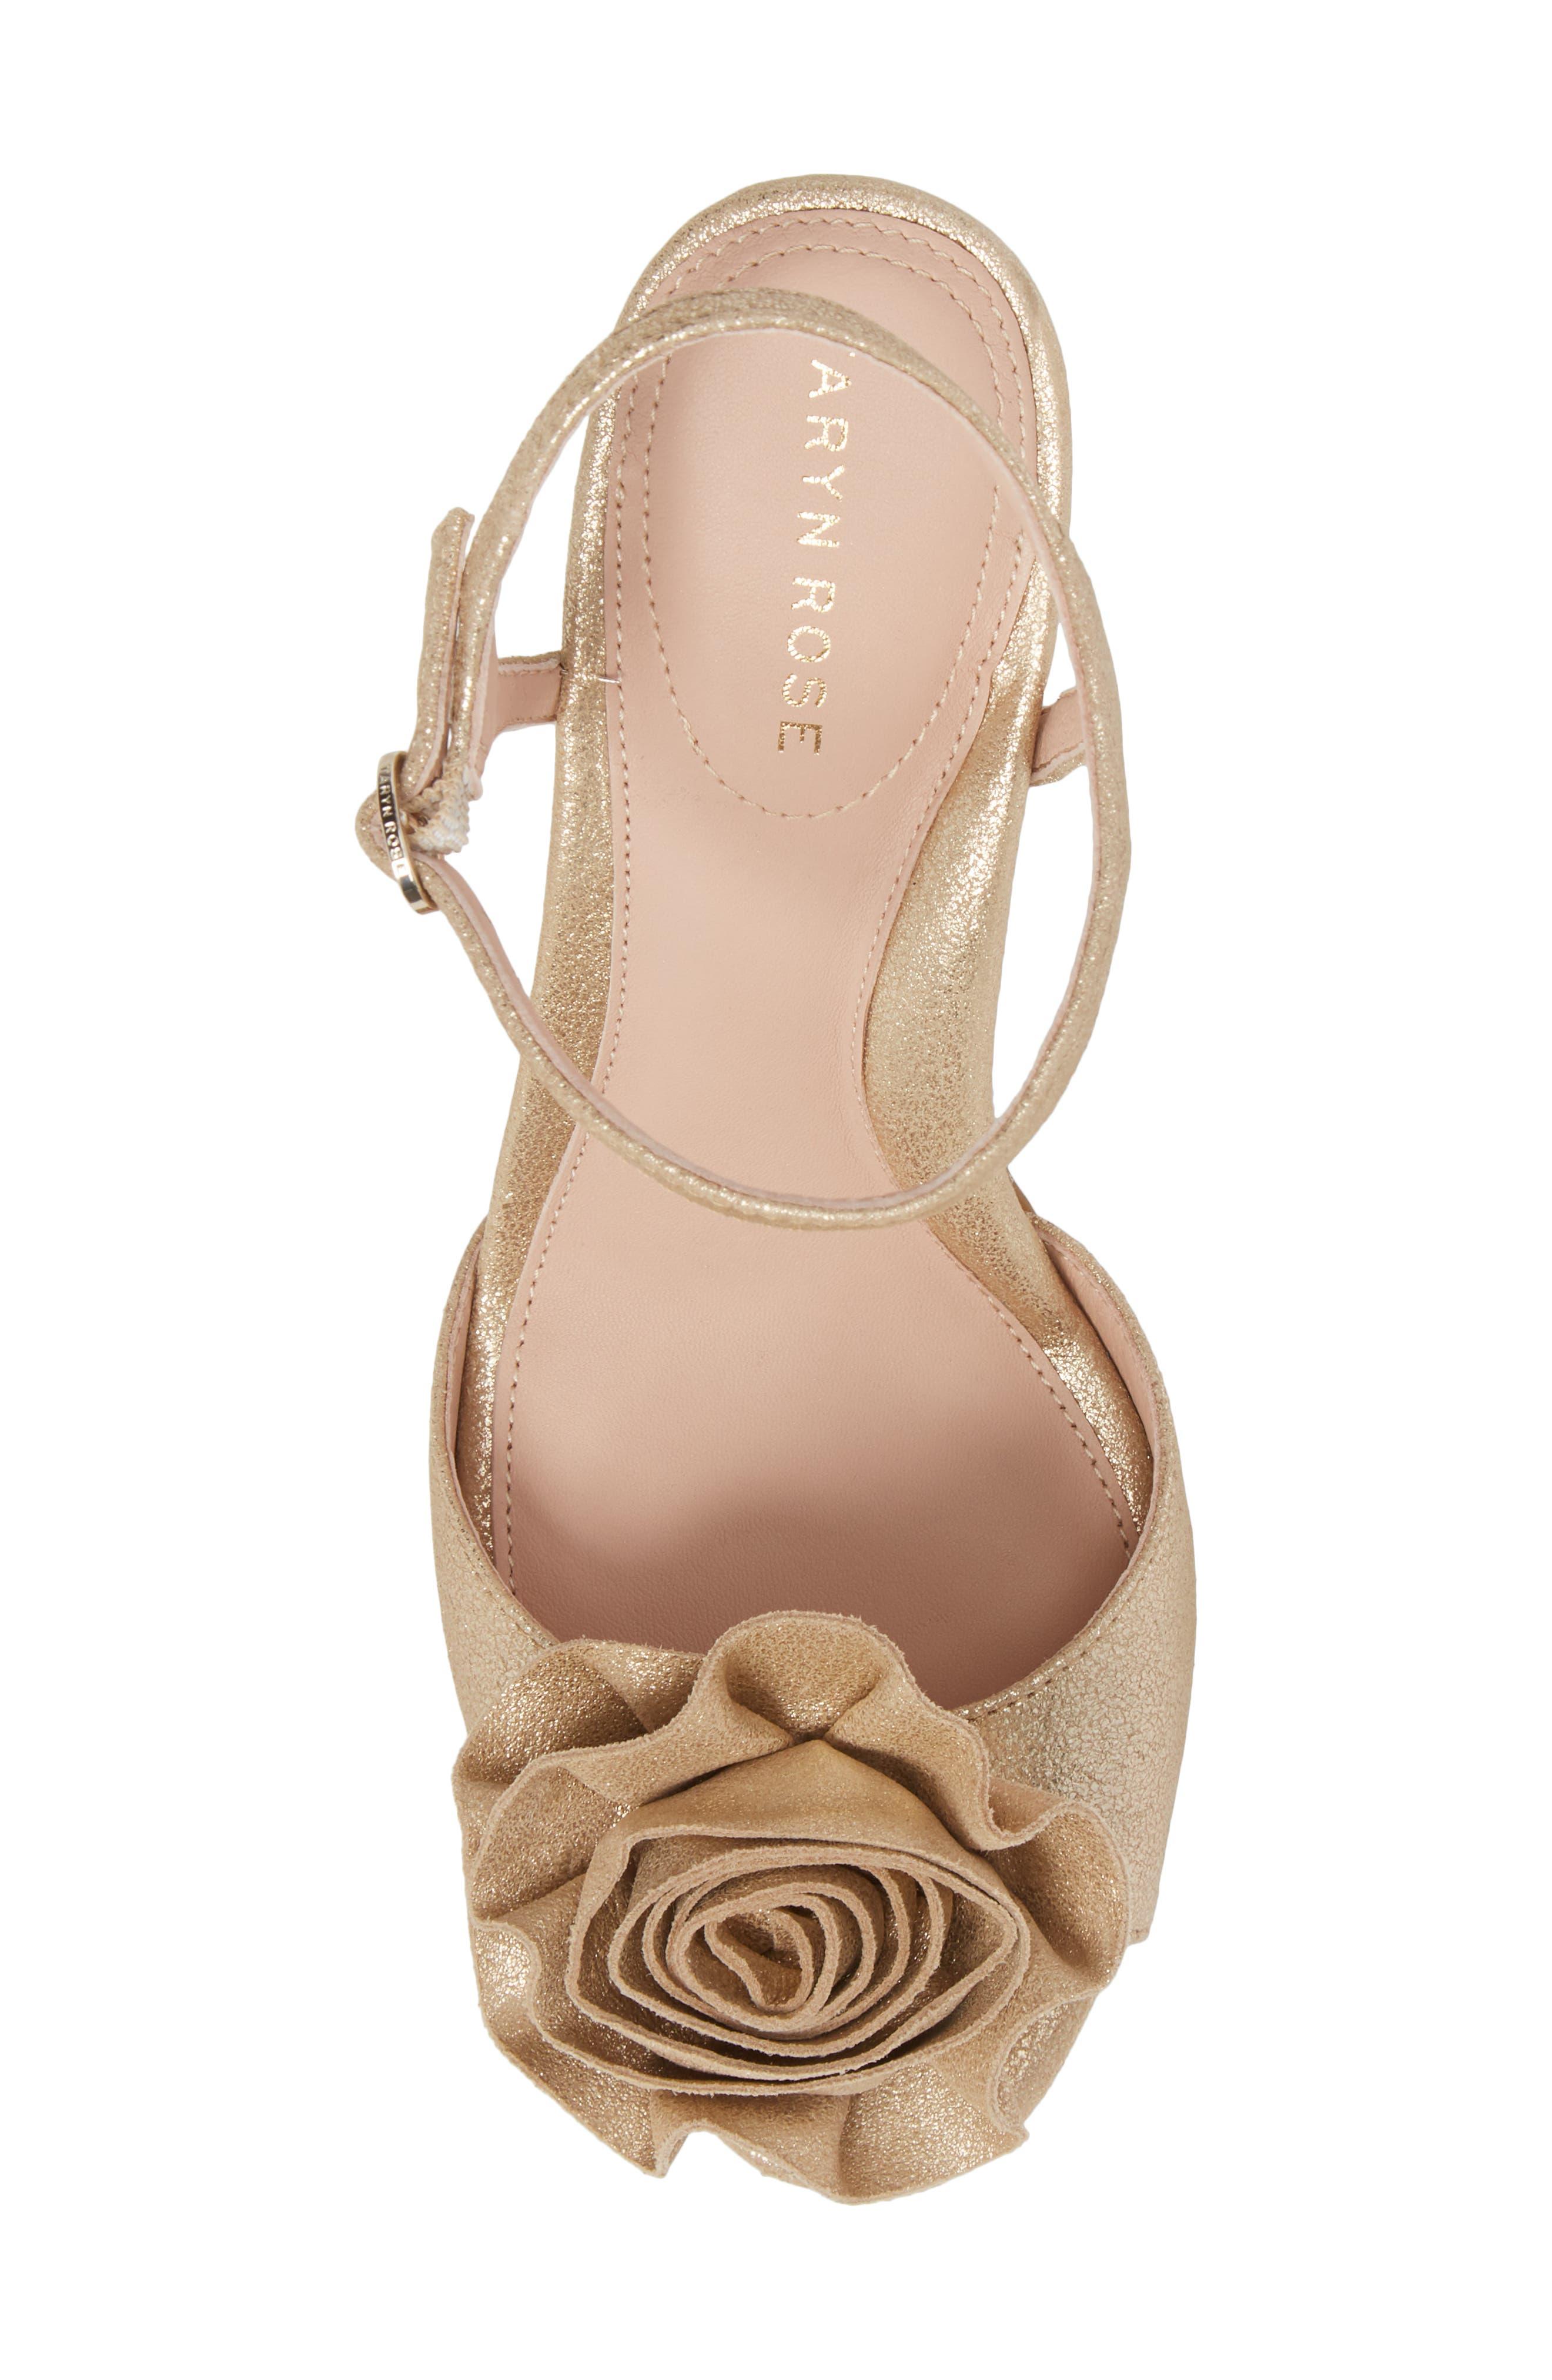 Jacklyn Flower Sandal,                             Alternate thumbnail 5, color,                             Gold Shimmer Fabric